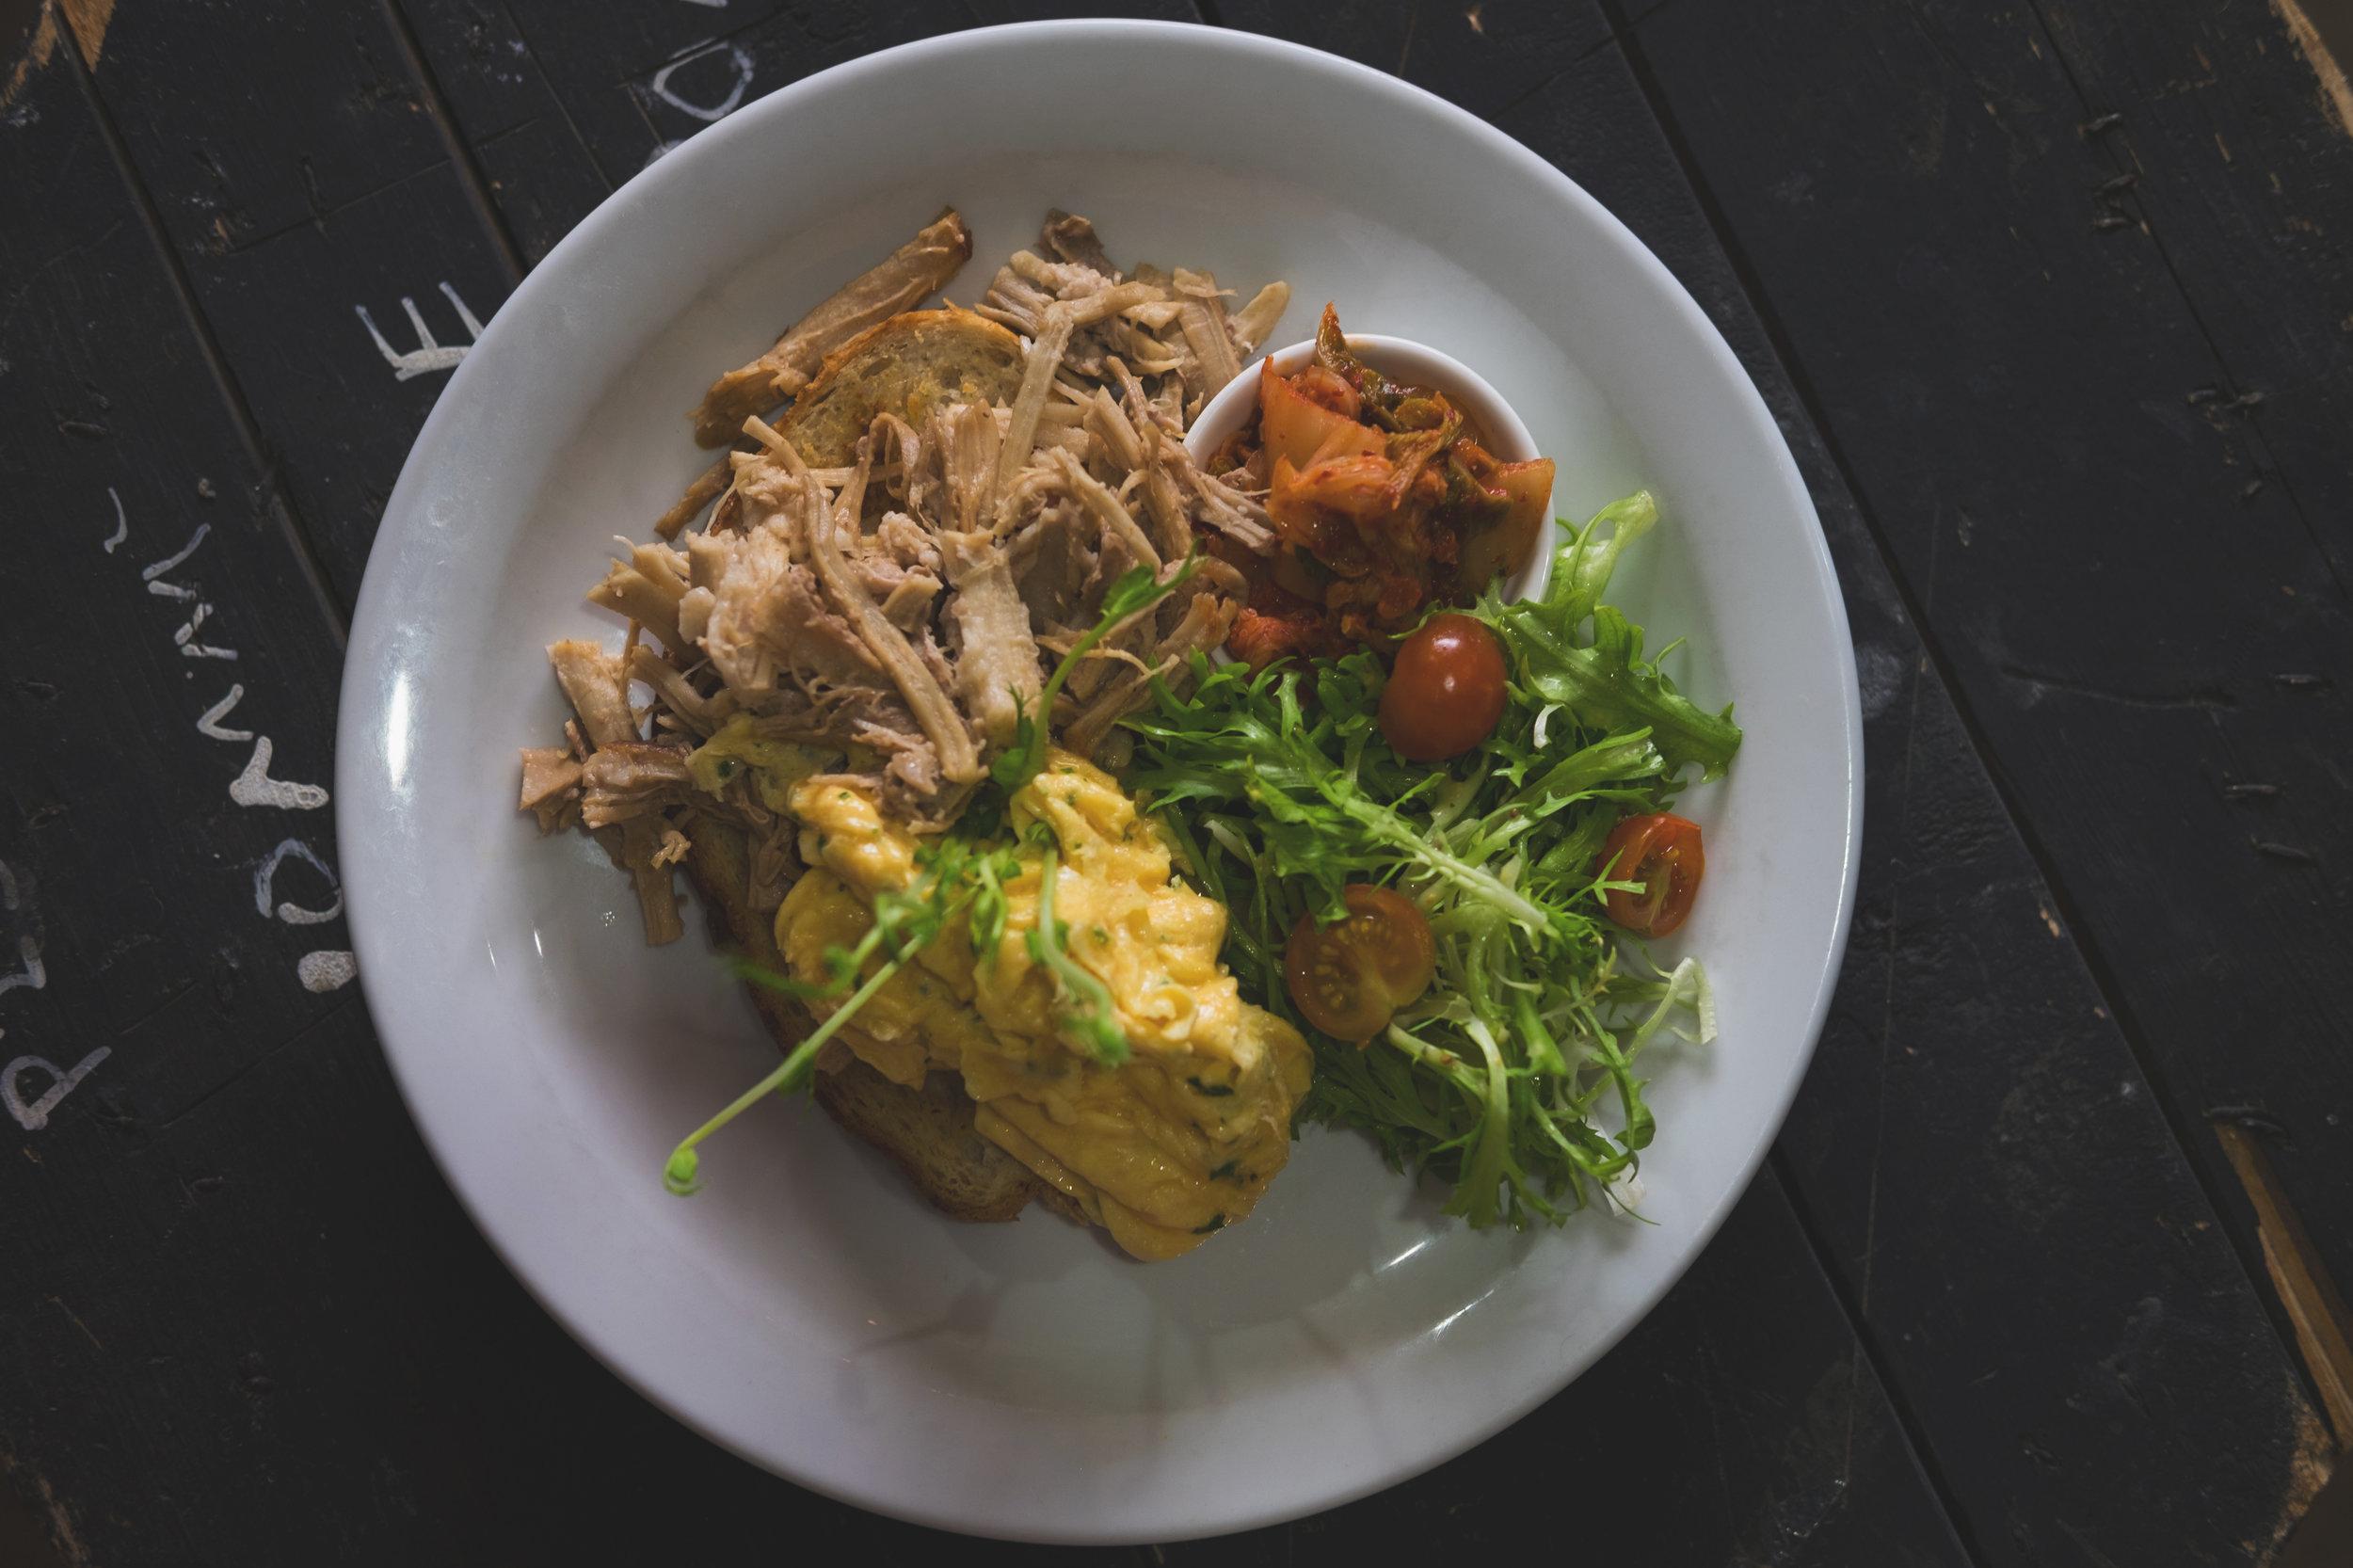 Pork belly, scrambled eggs, kimchi